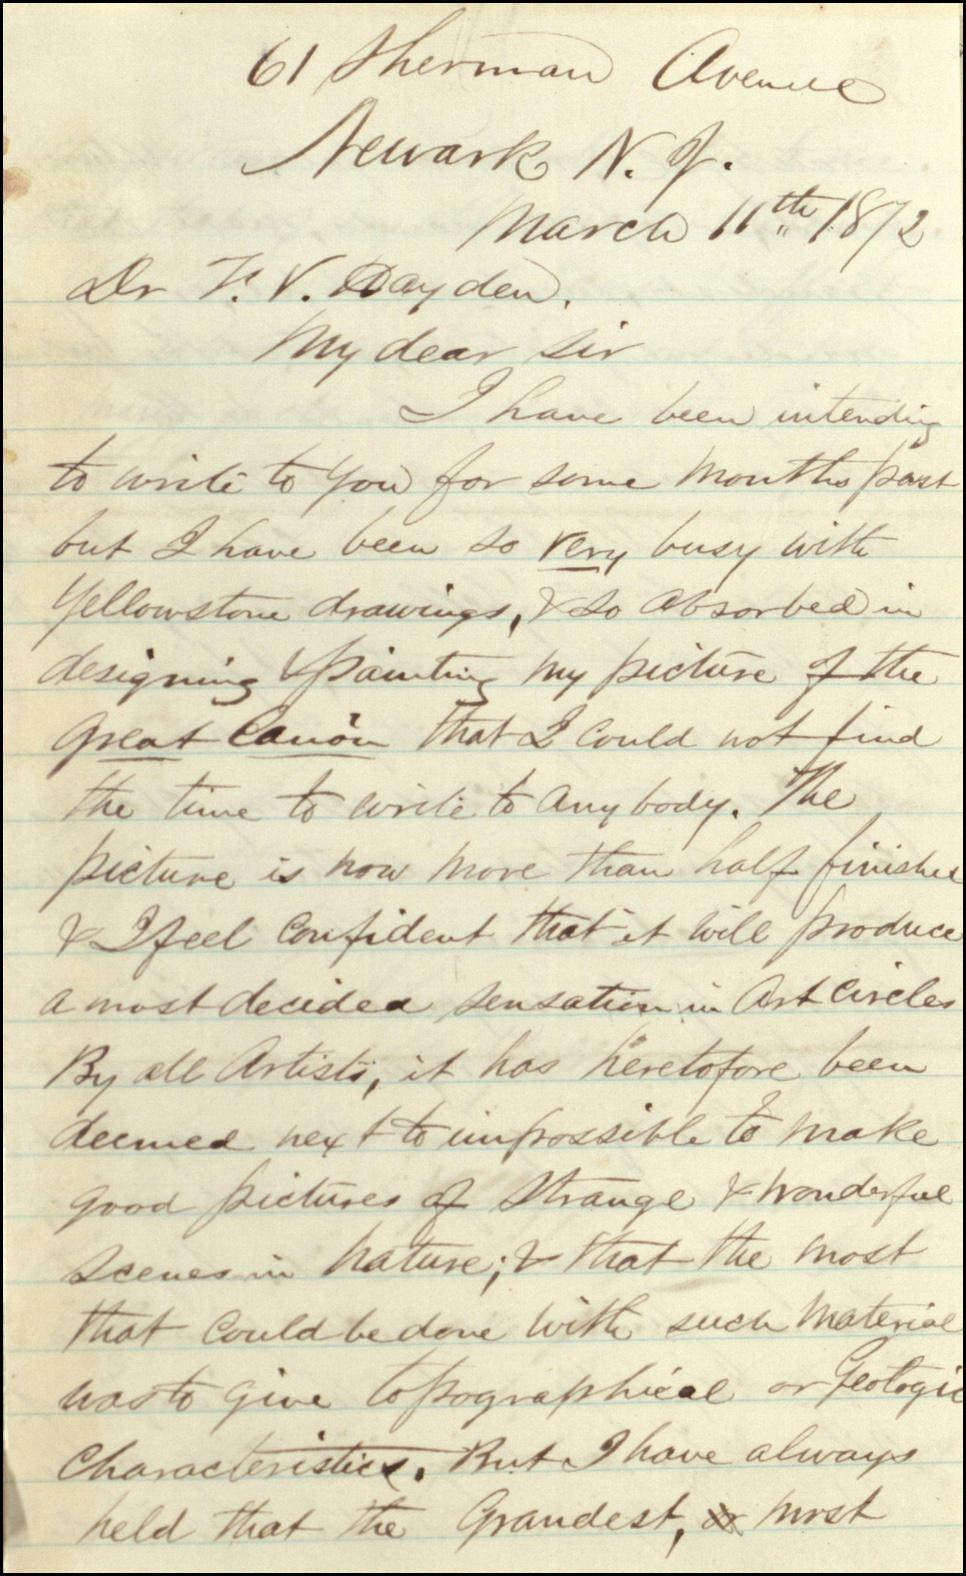 Letter from Thomas Moran to Frederick V. Hayden_NARA